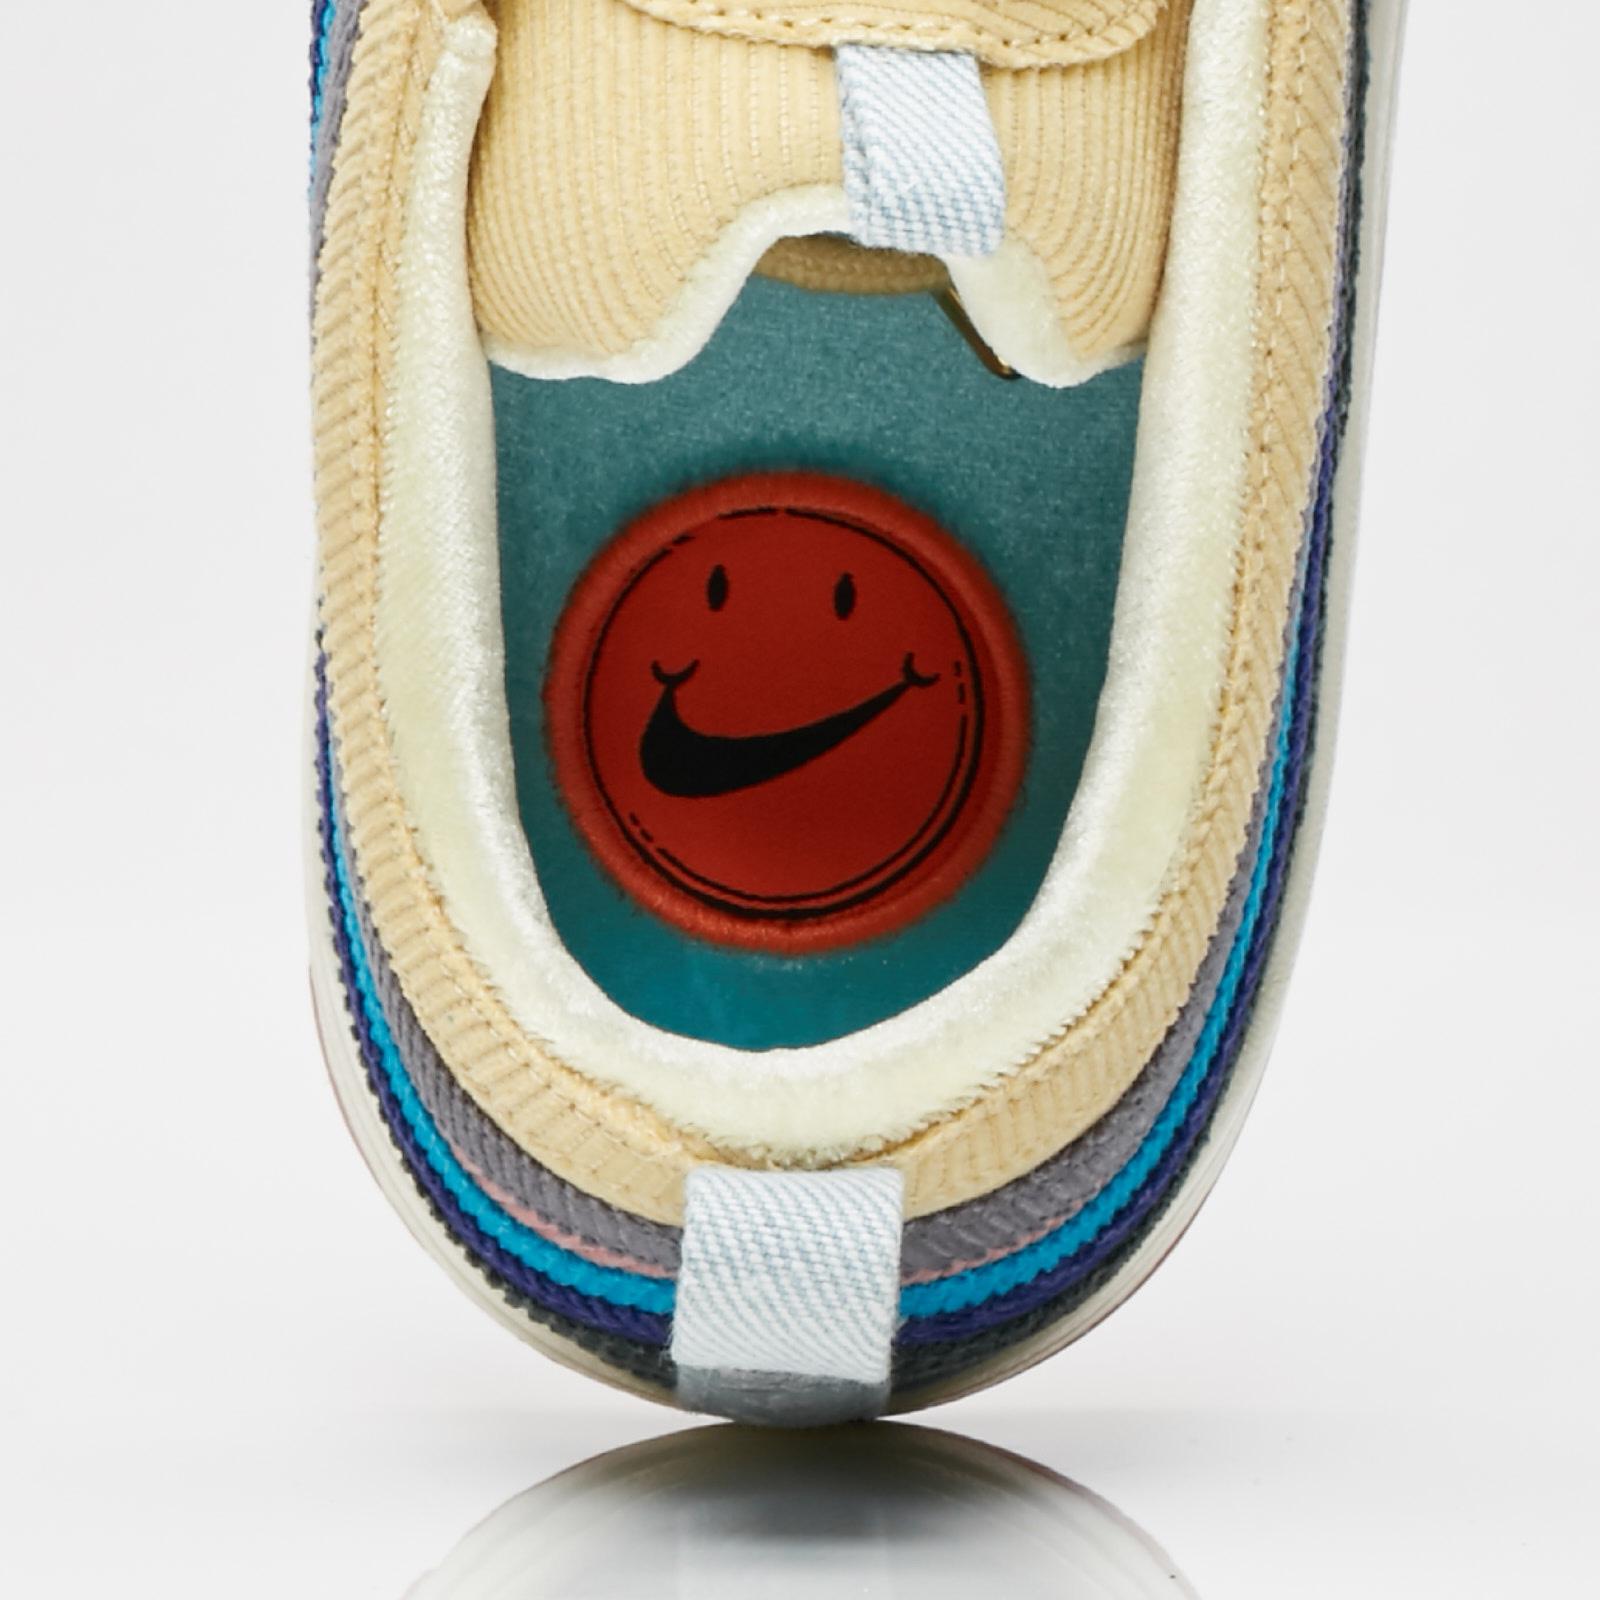 1017e81c185d9 Nike Air Max 1/97 VF Sean Wotherspoon - Aj4219-400 - Sneakersnstuff |  sneakers & streetwear online since 1999